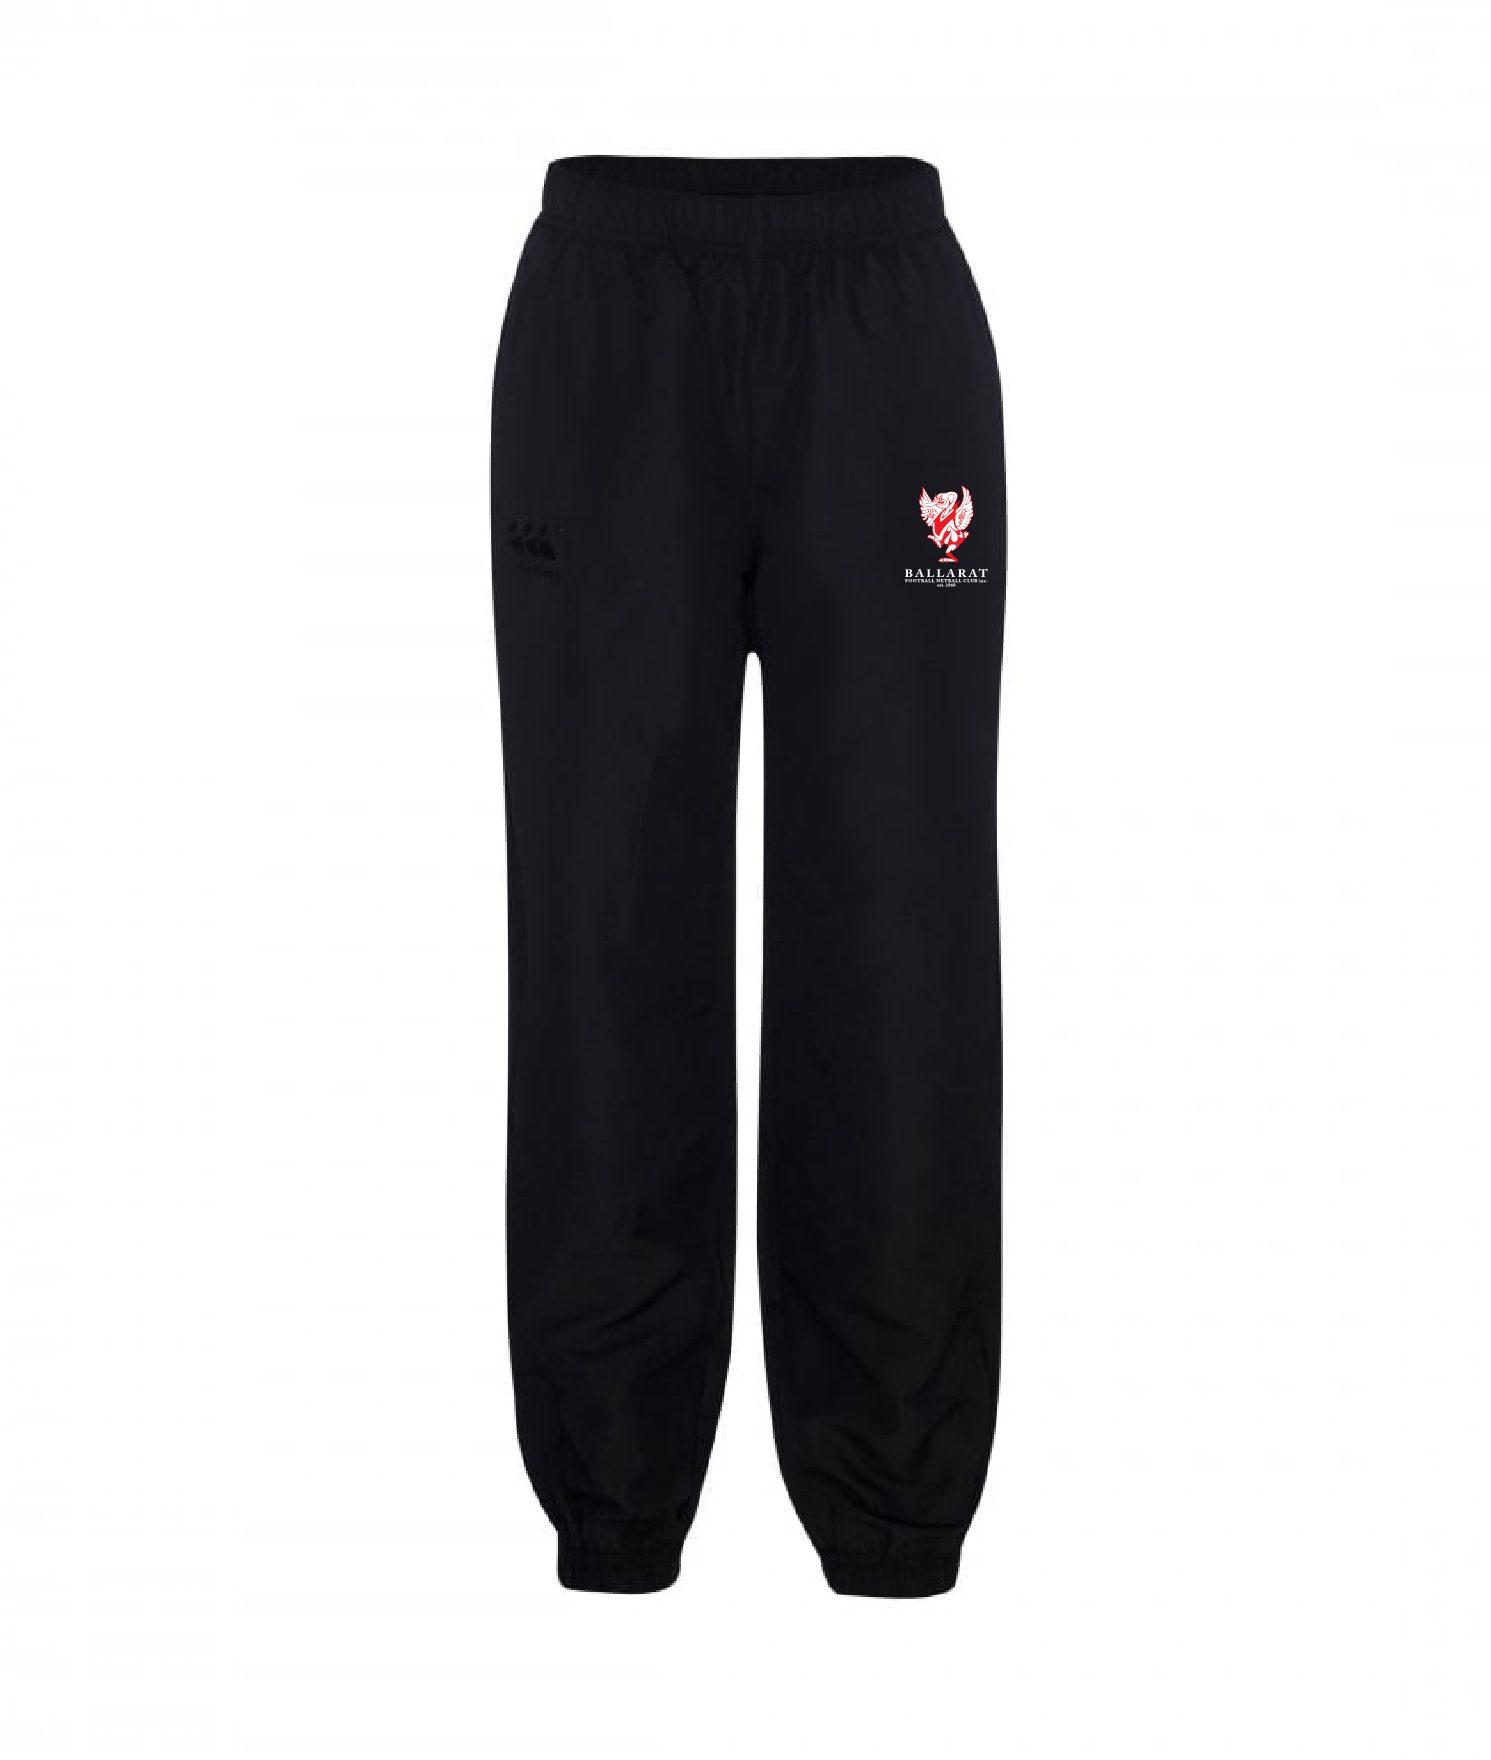 16583702 Ballarat Football Netball Club » Kids Tracksuit Pants